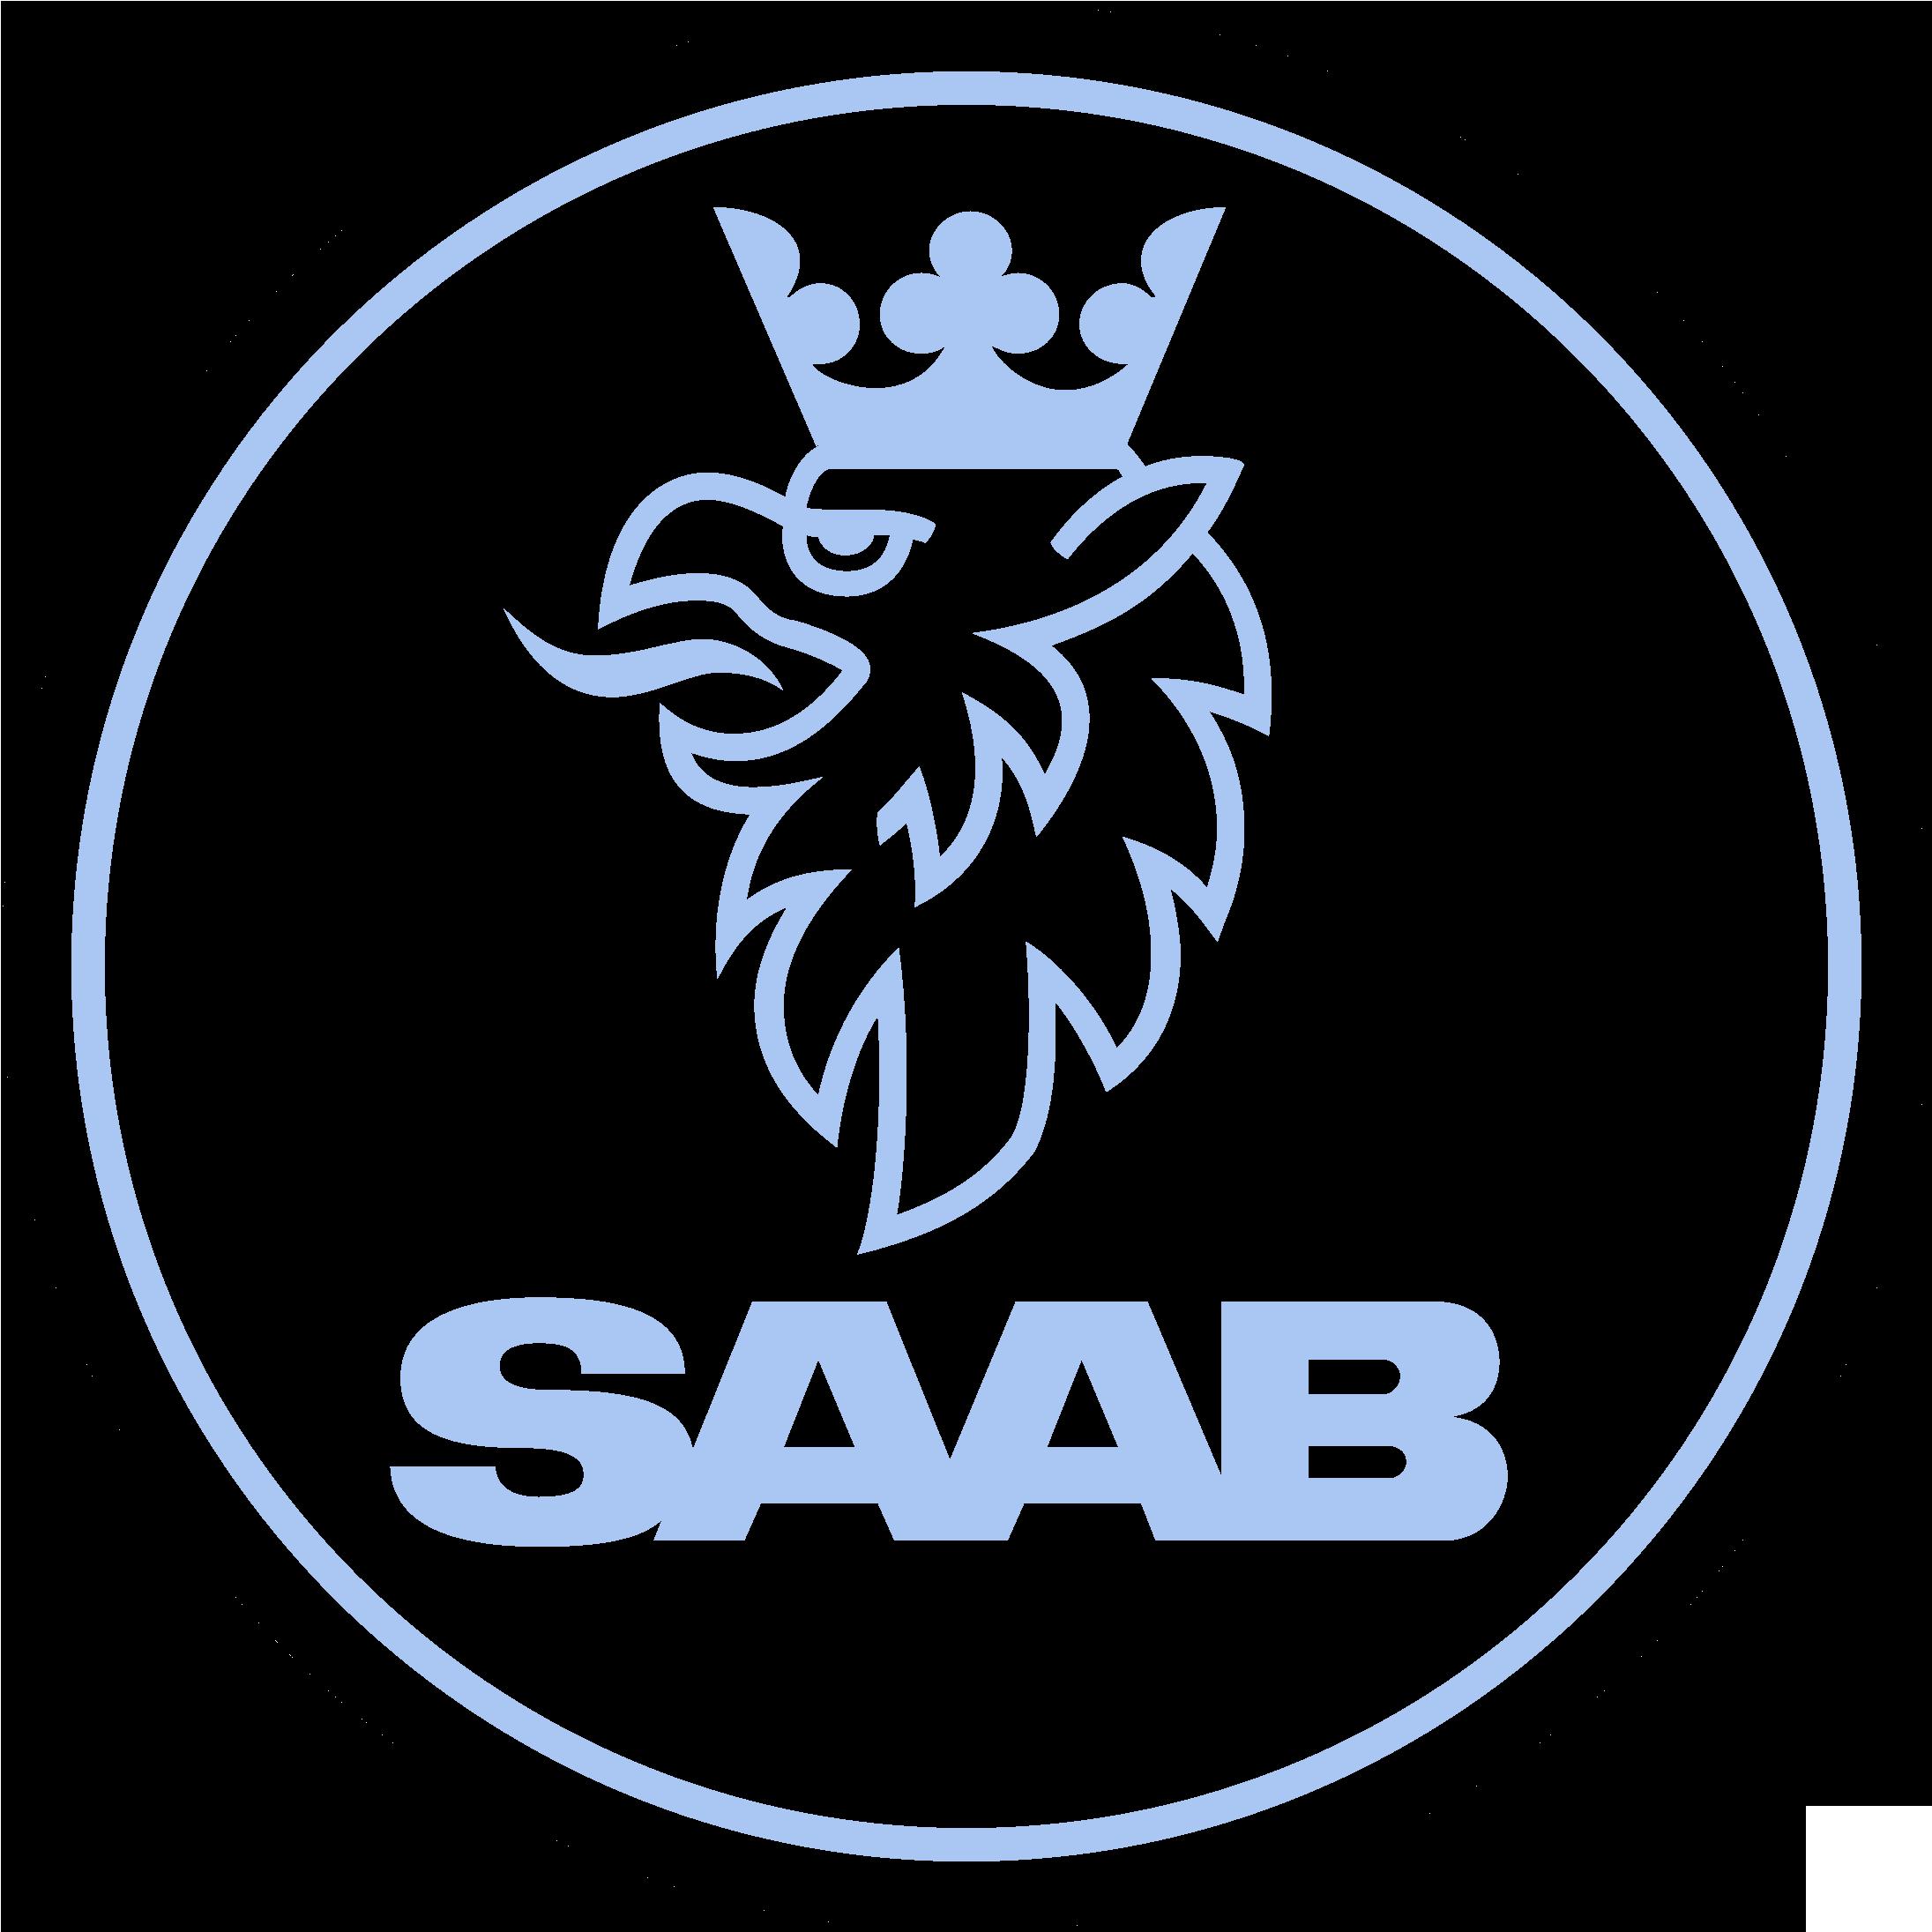 Saab 90 manufacturer logo